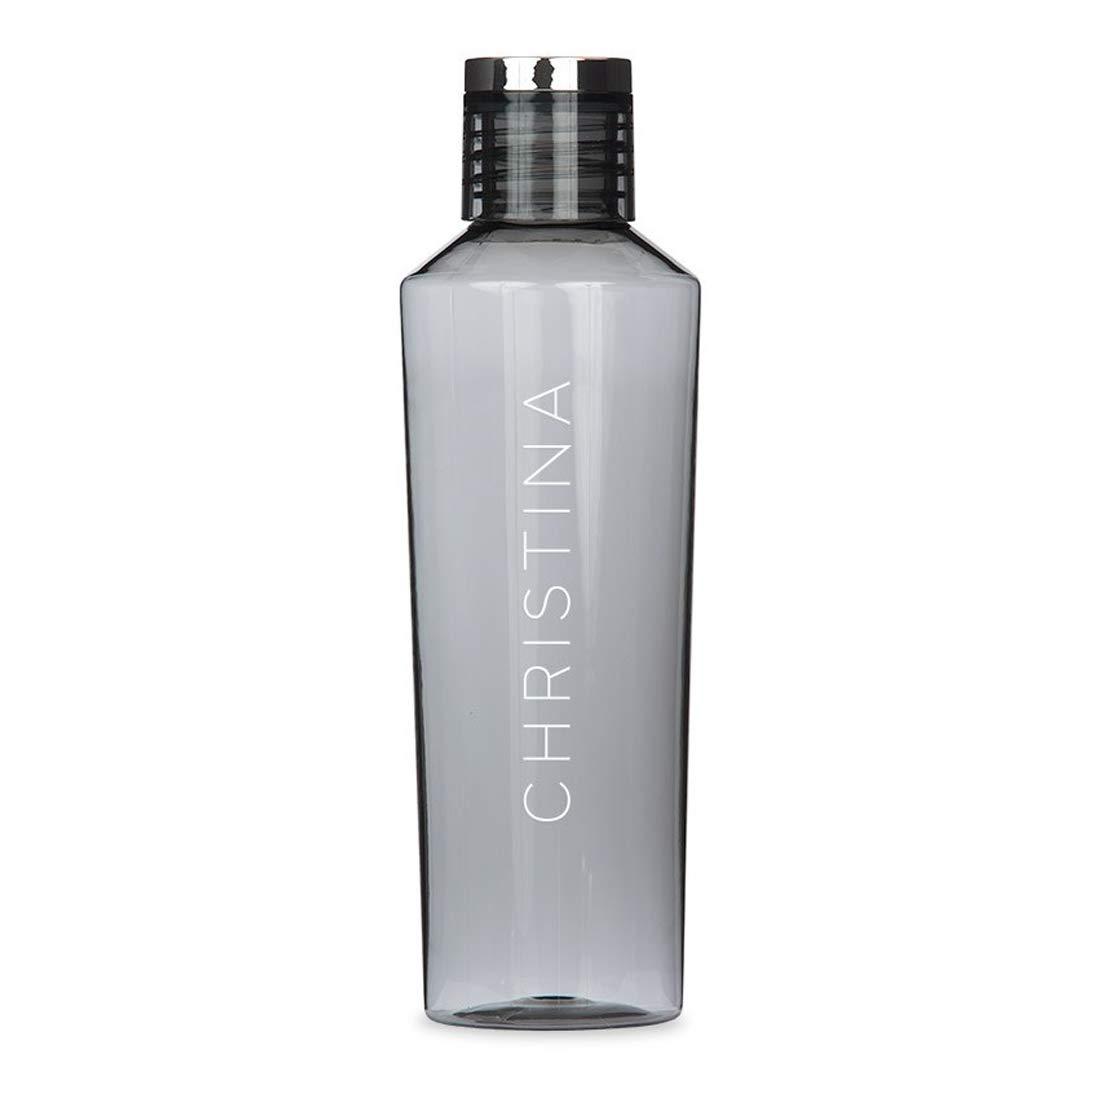 Weddingstar Personalized Tritan Plastic Water Bottle 27oz – Reusable Customizable Eco-Friendly Plastic Water Bottle – 100% BPA-Free Environmentally Friendly Canteen - Vertical Print Charcoal